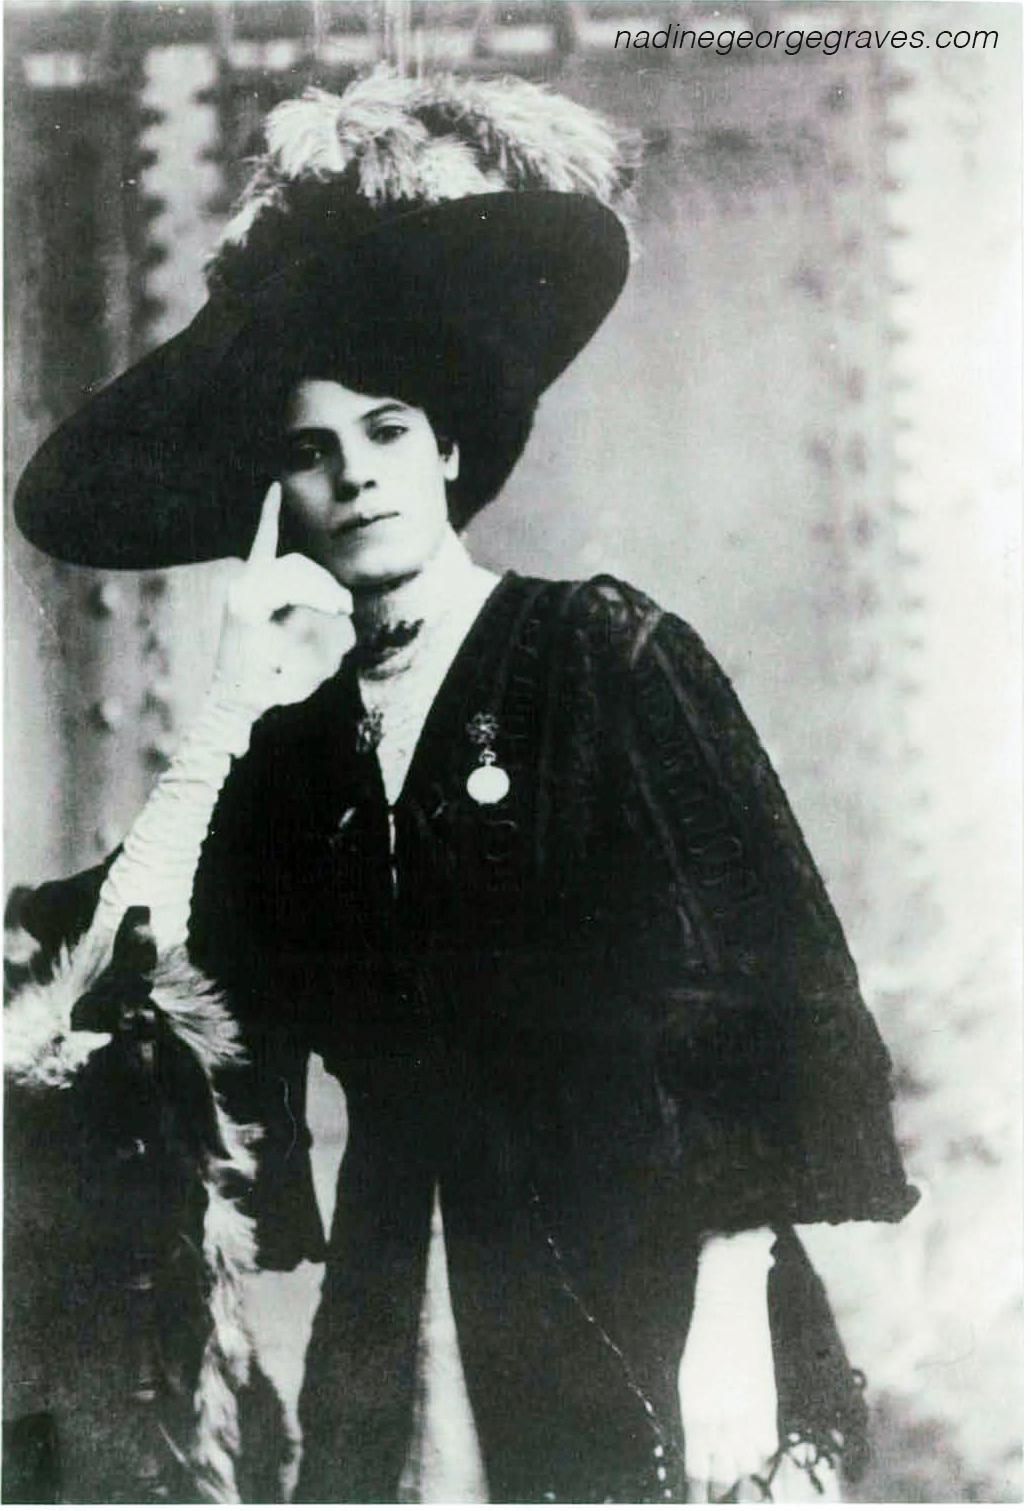 Alberta Whitman